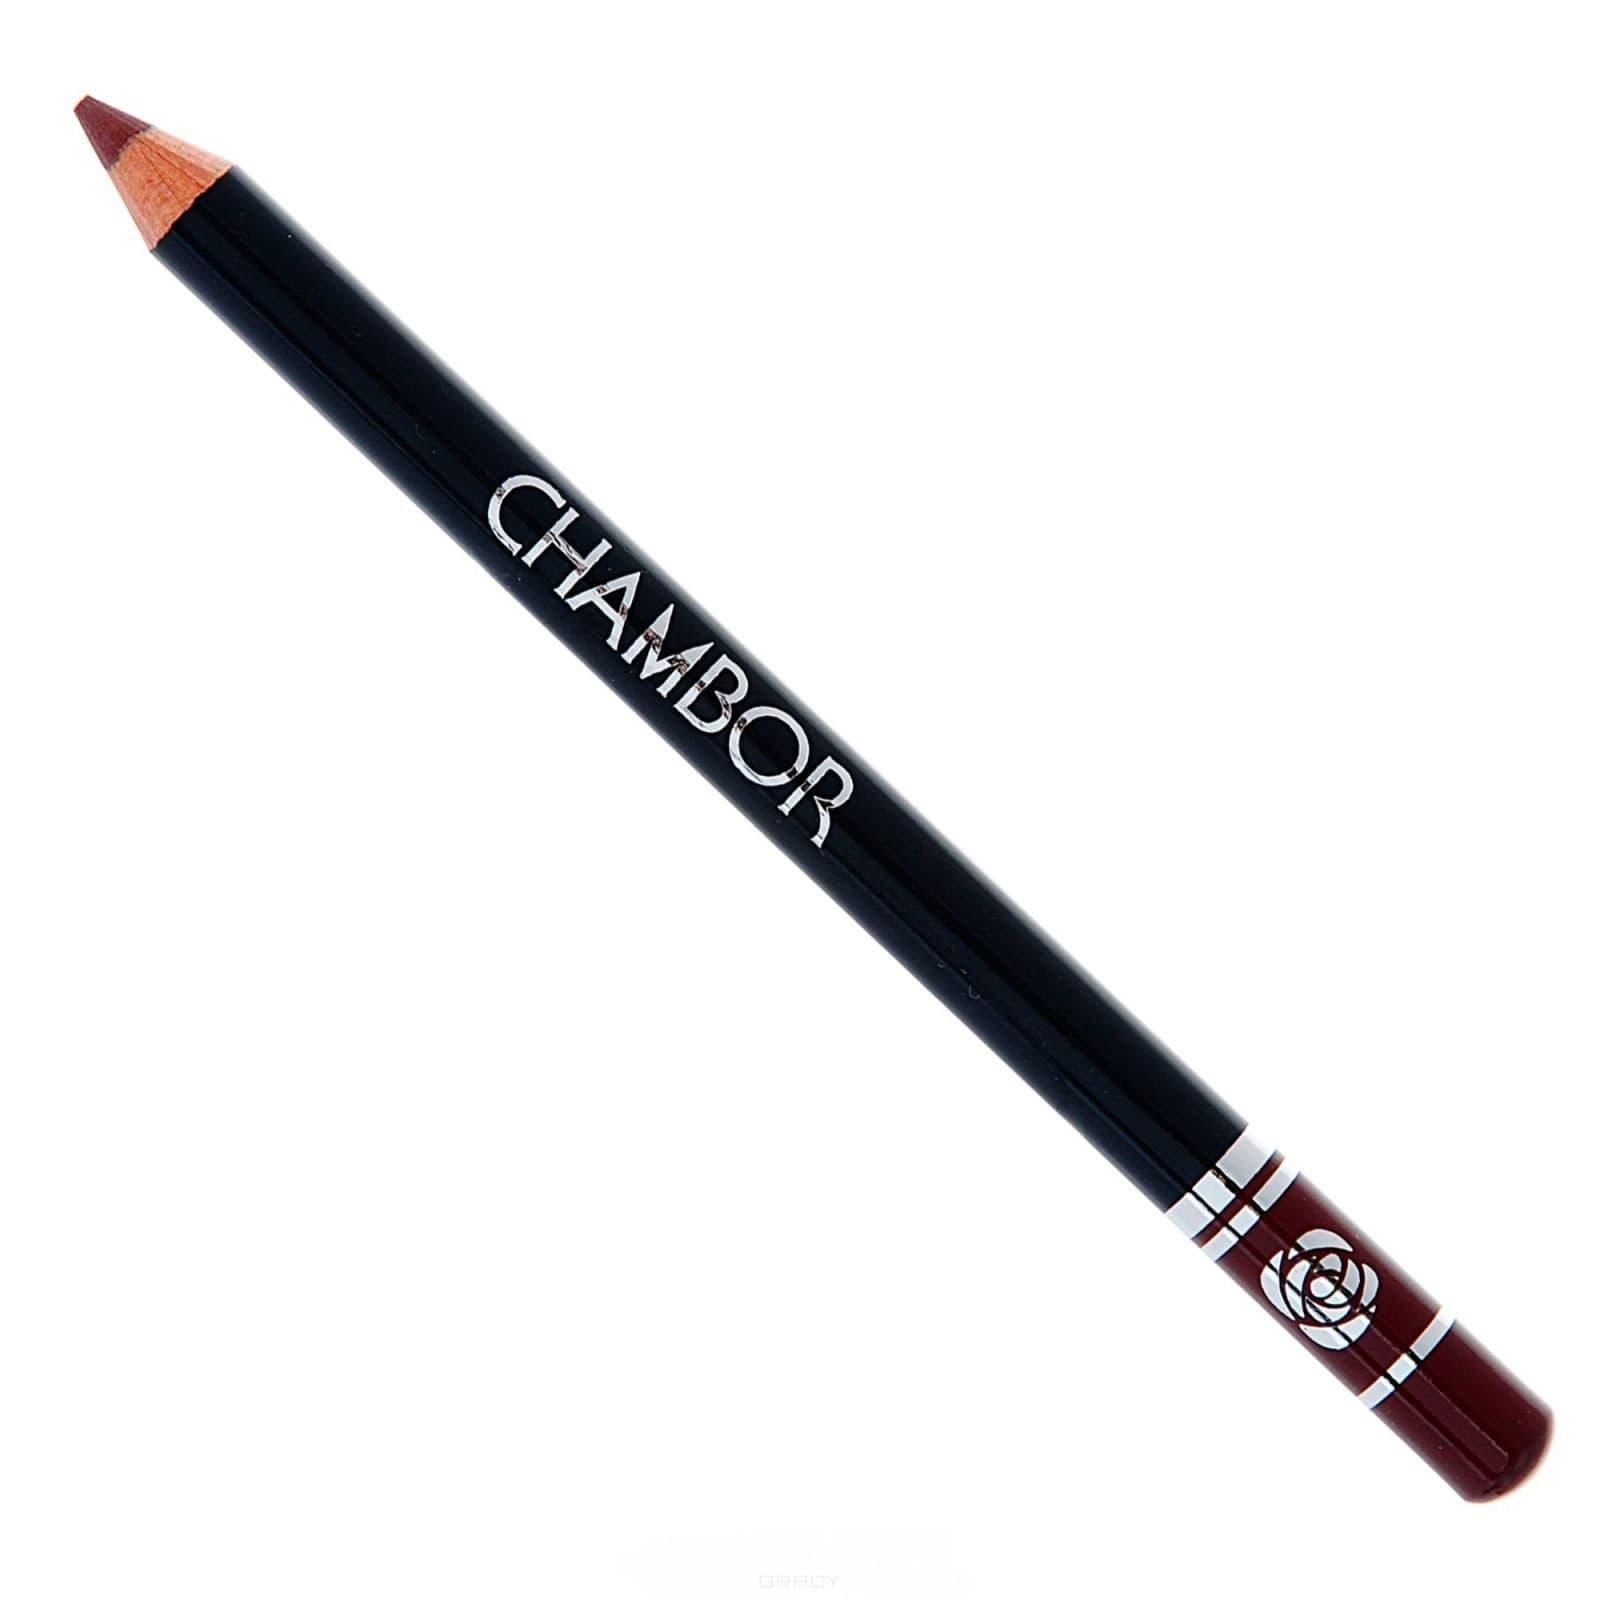 Chambor, Карандаш для губ Lip Contour Pencil, 1,15 гр., maroon 1,15 гр. темно-красный кирпичныйДля губ<br><br>